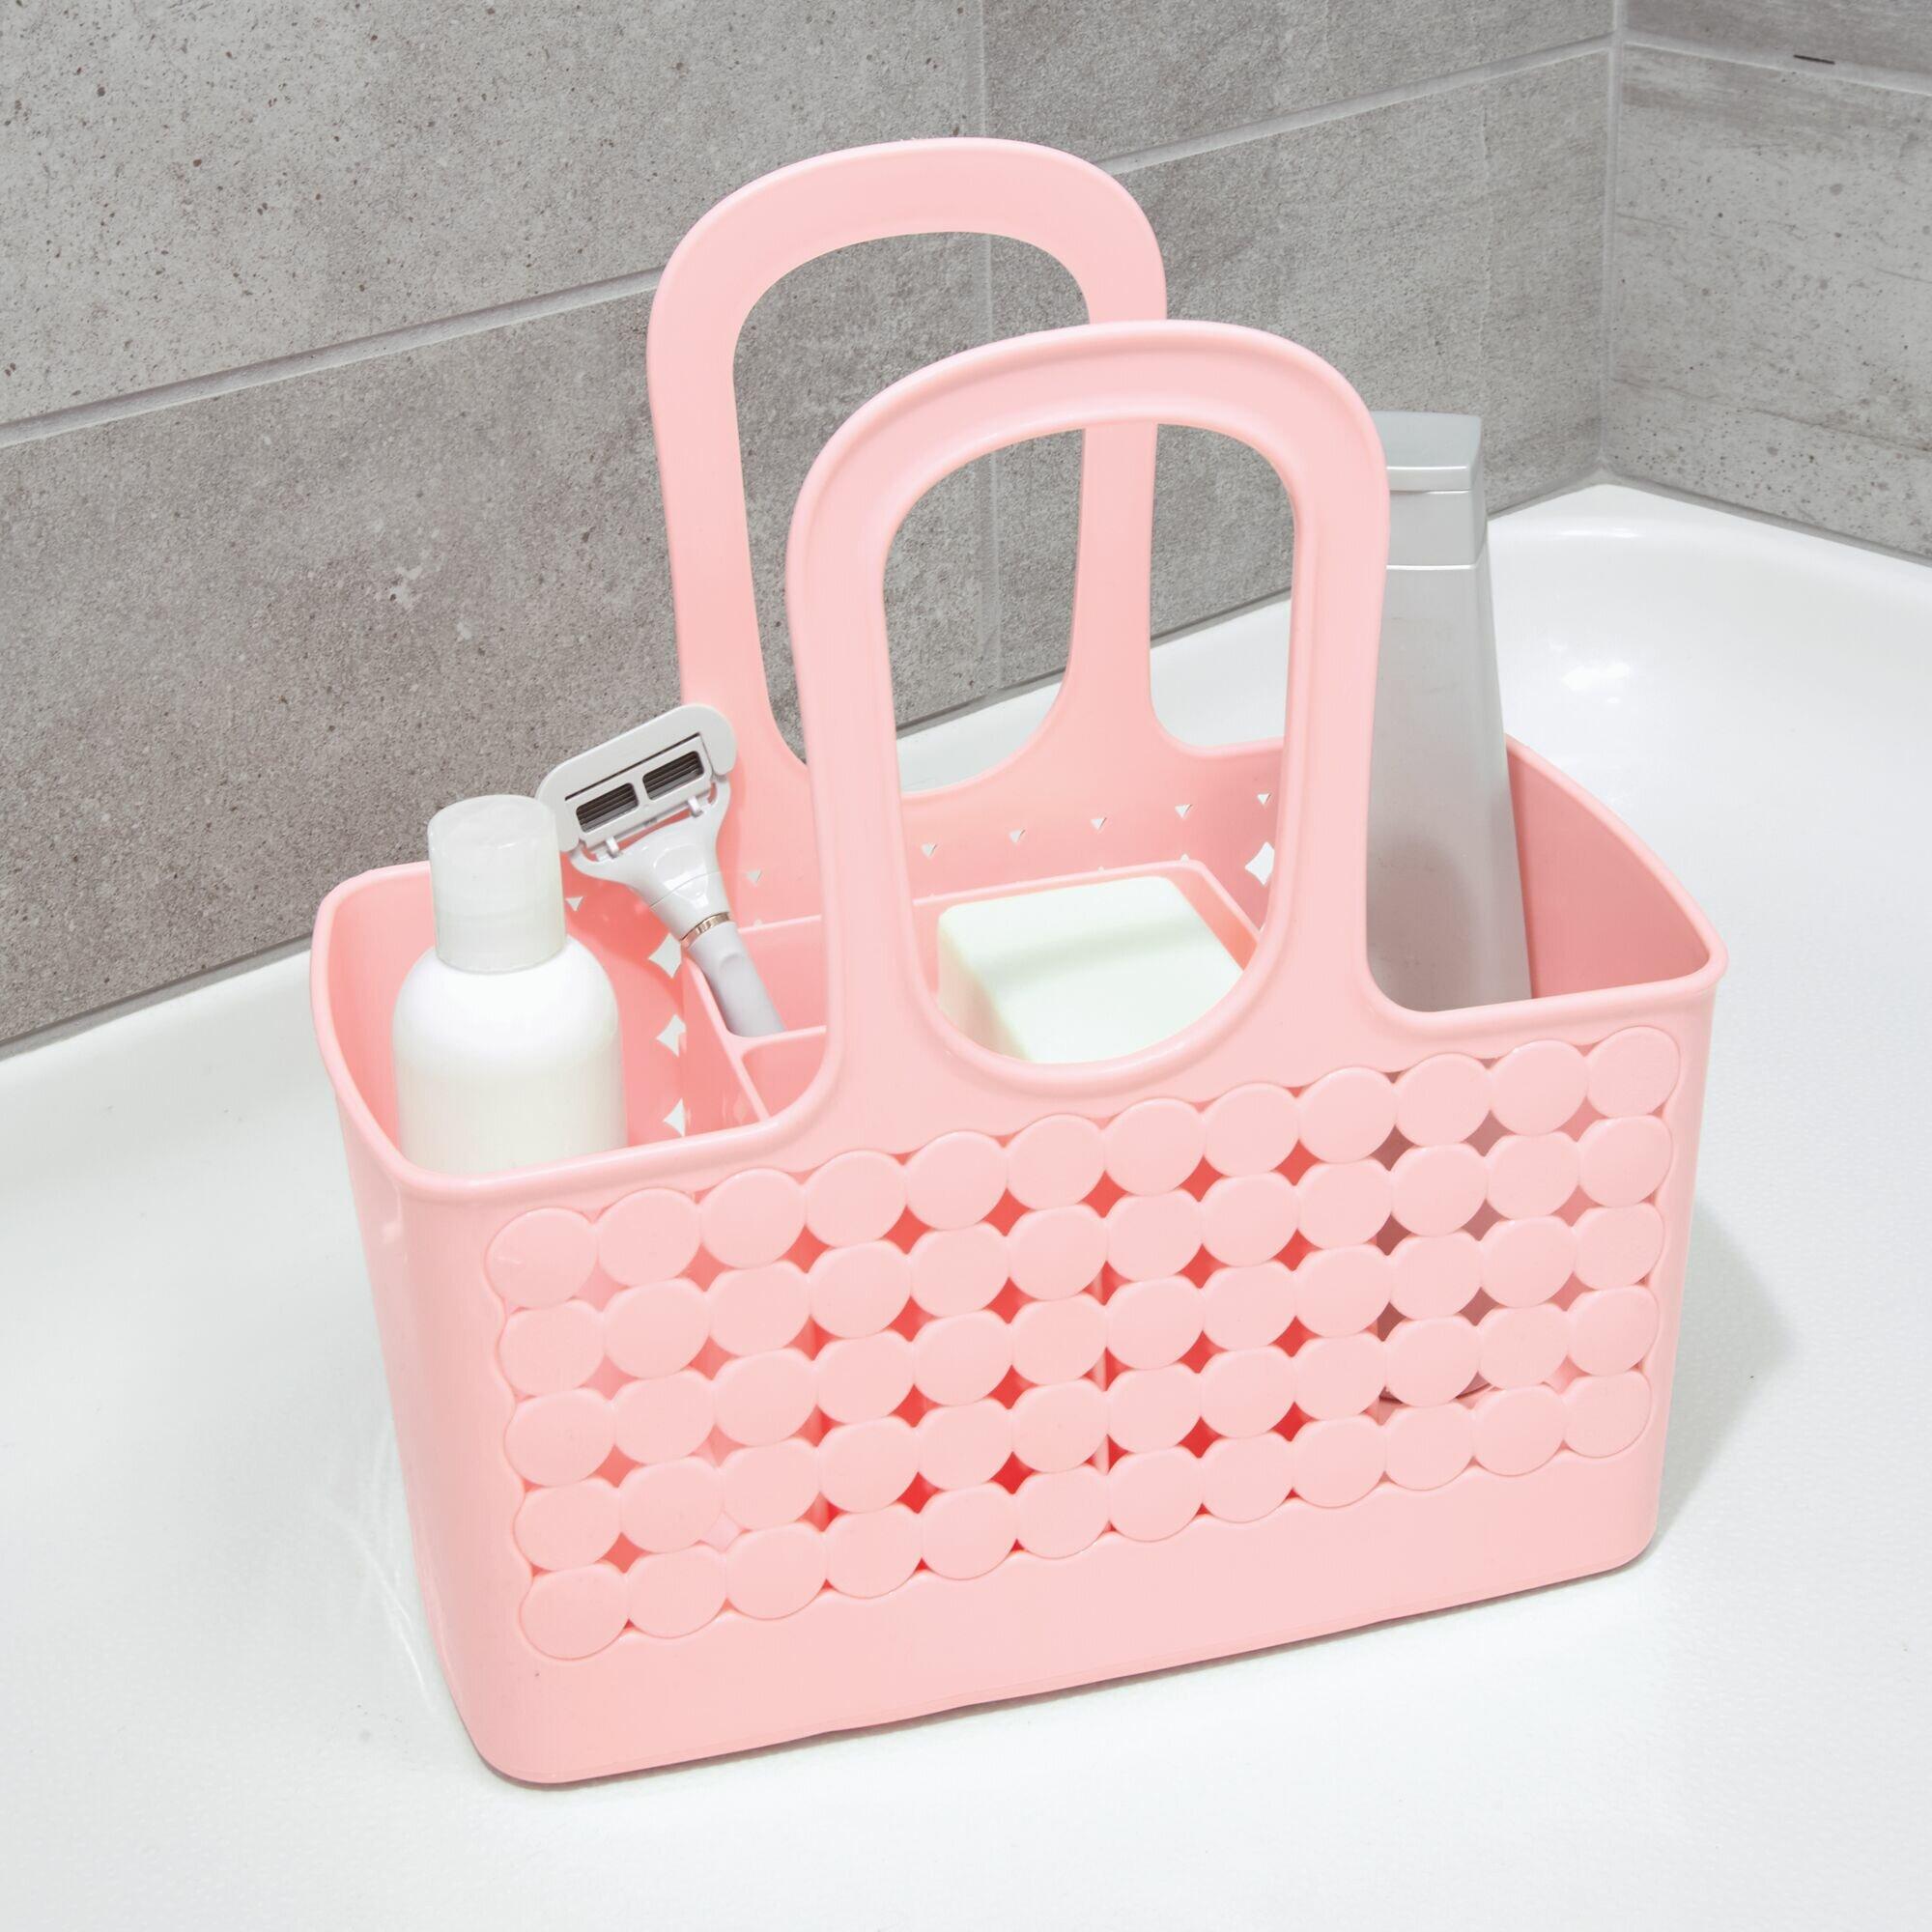 Idesign Orbz Divided Portable Shower Caddy Reviews Wayfair